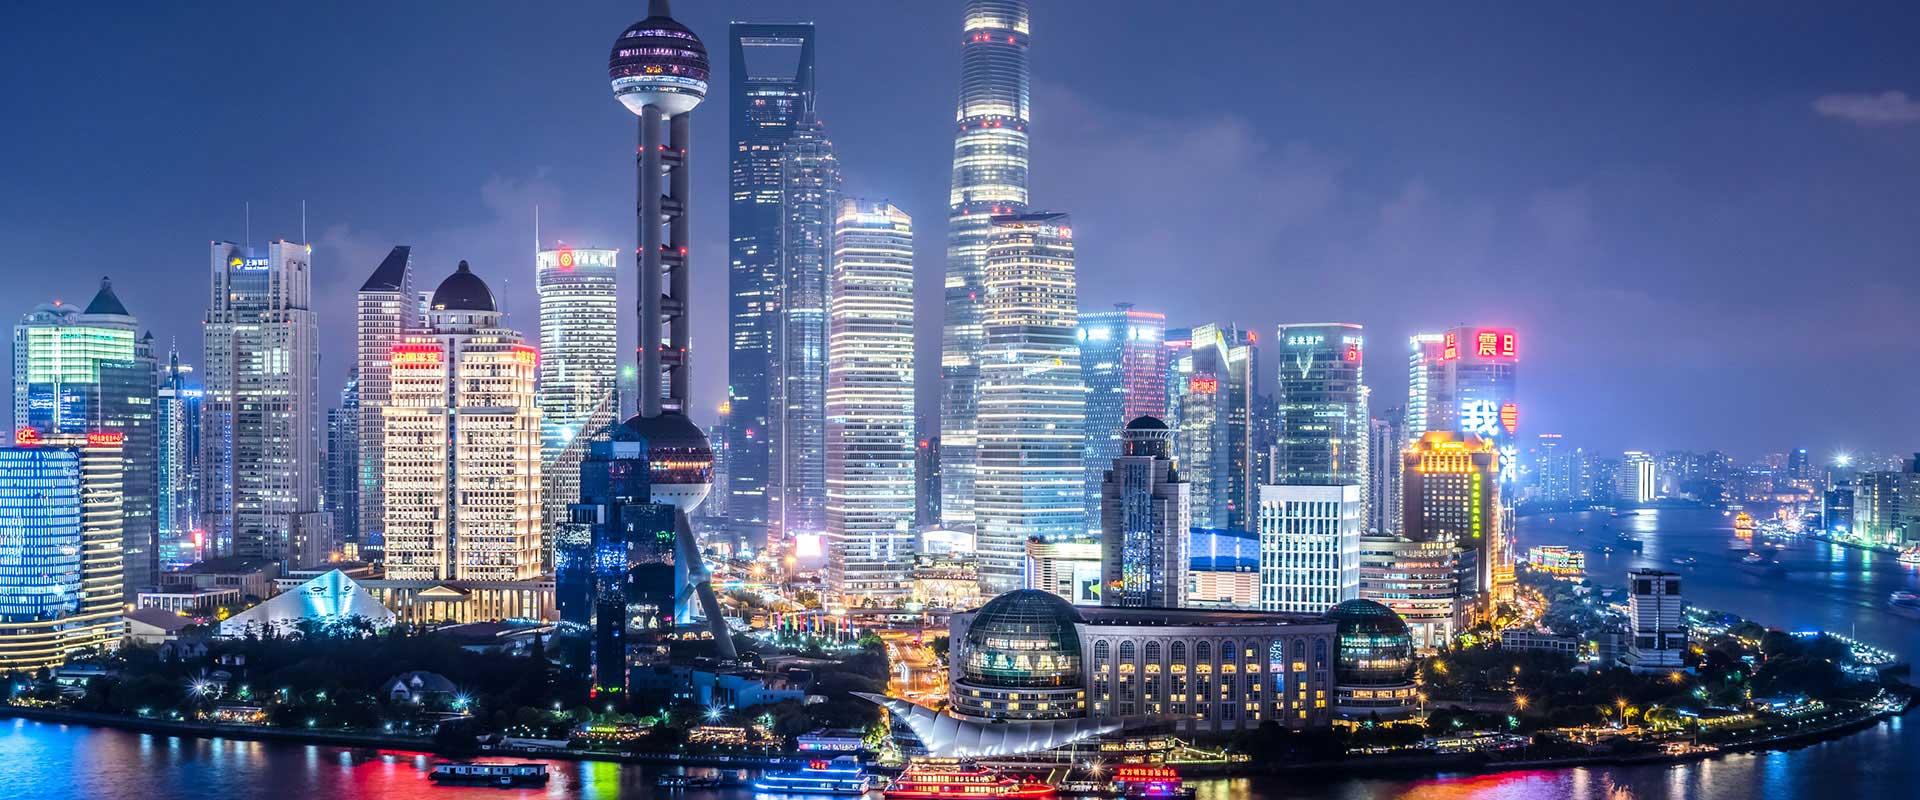 Shanghai-Skyline-Night-Big-Bus-Tours-01-2017